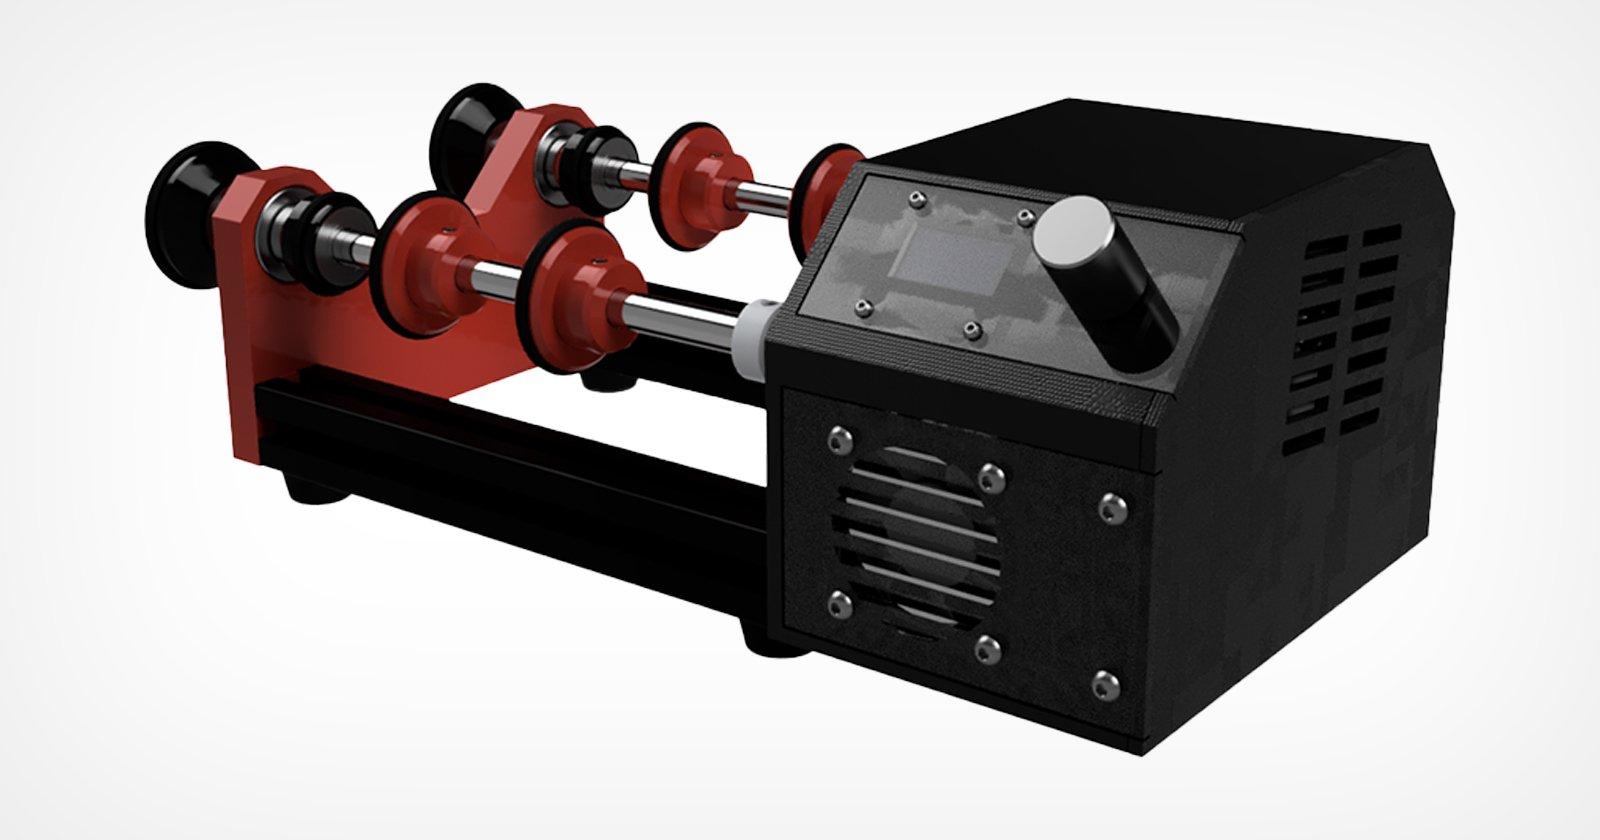 L'Aura è una nuova macchina per lo sviluppo di film rotativi assistiti